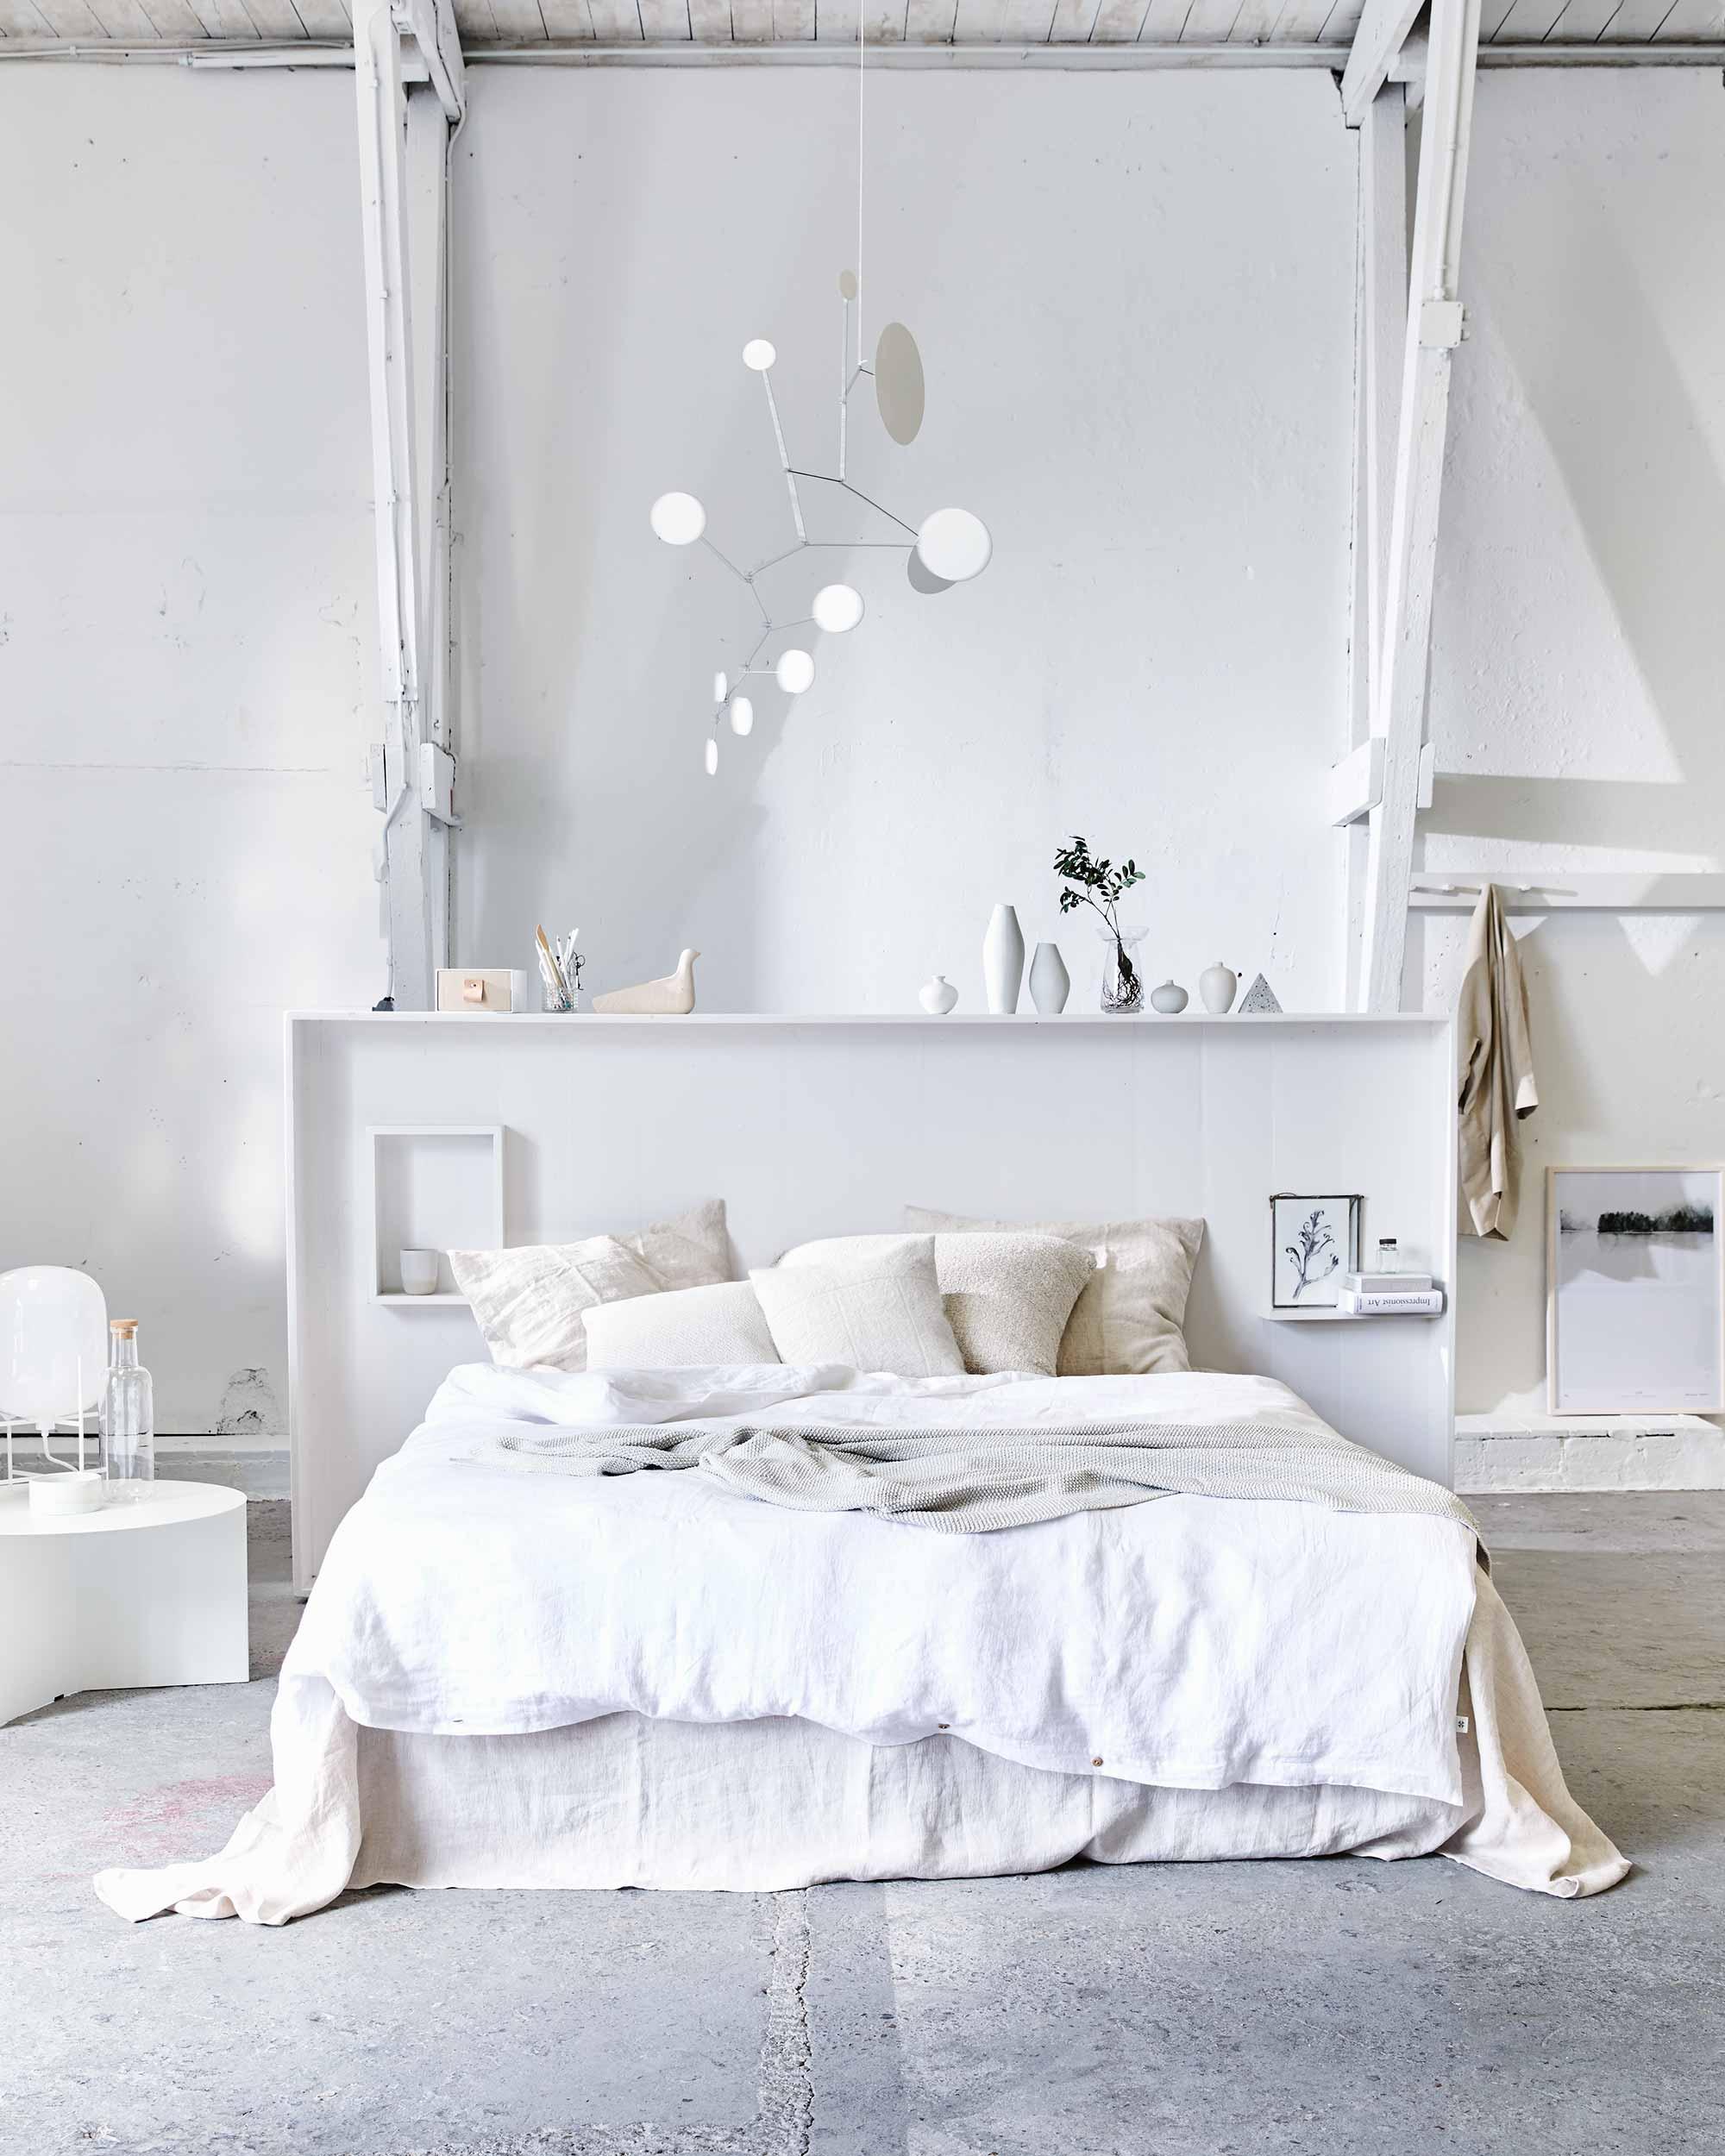 Zomer zen slaapkamer styling